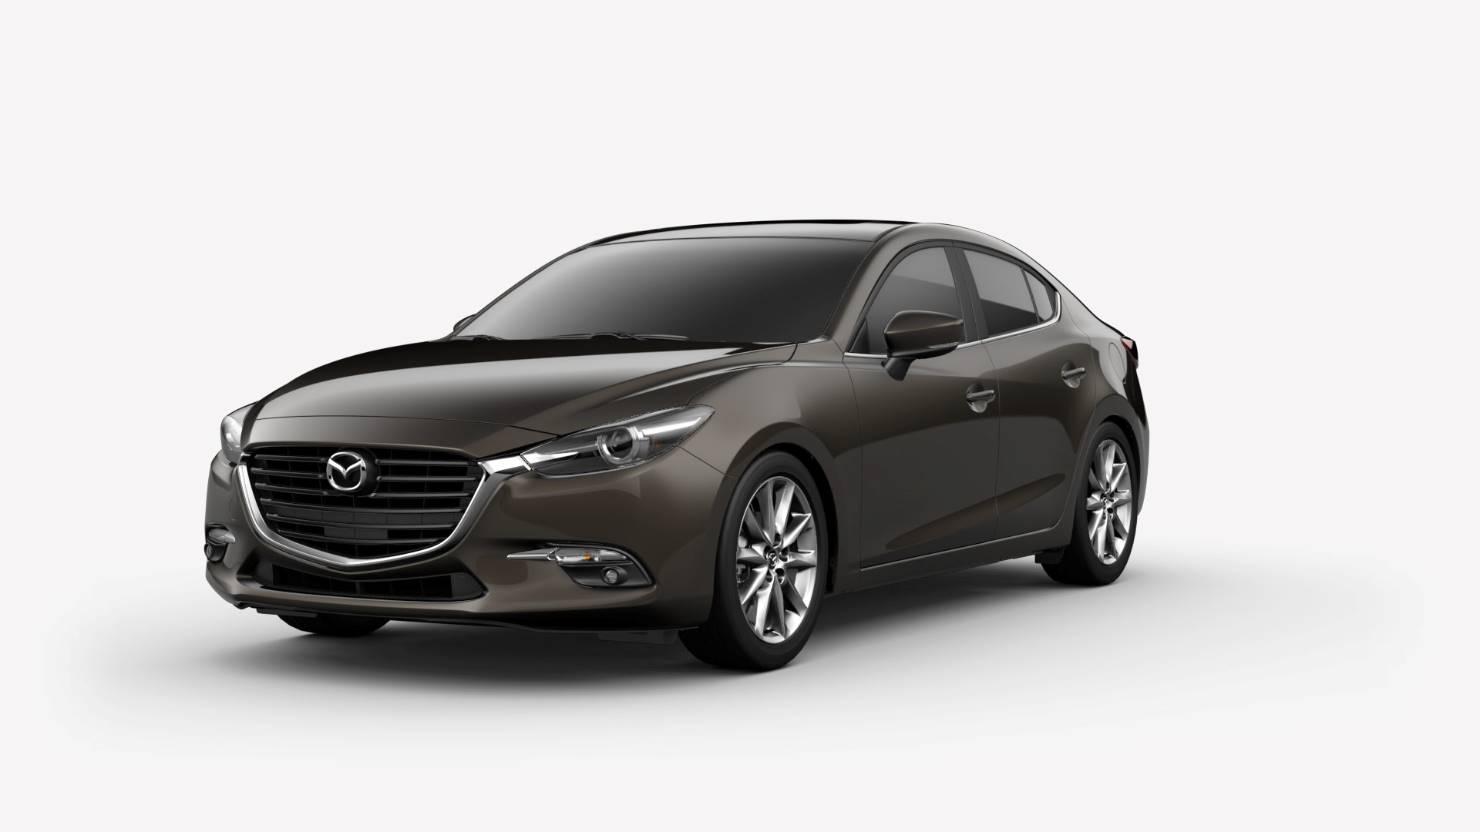 2018 Mazda3 Sedan, Titanium Flash